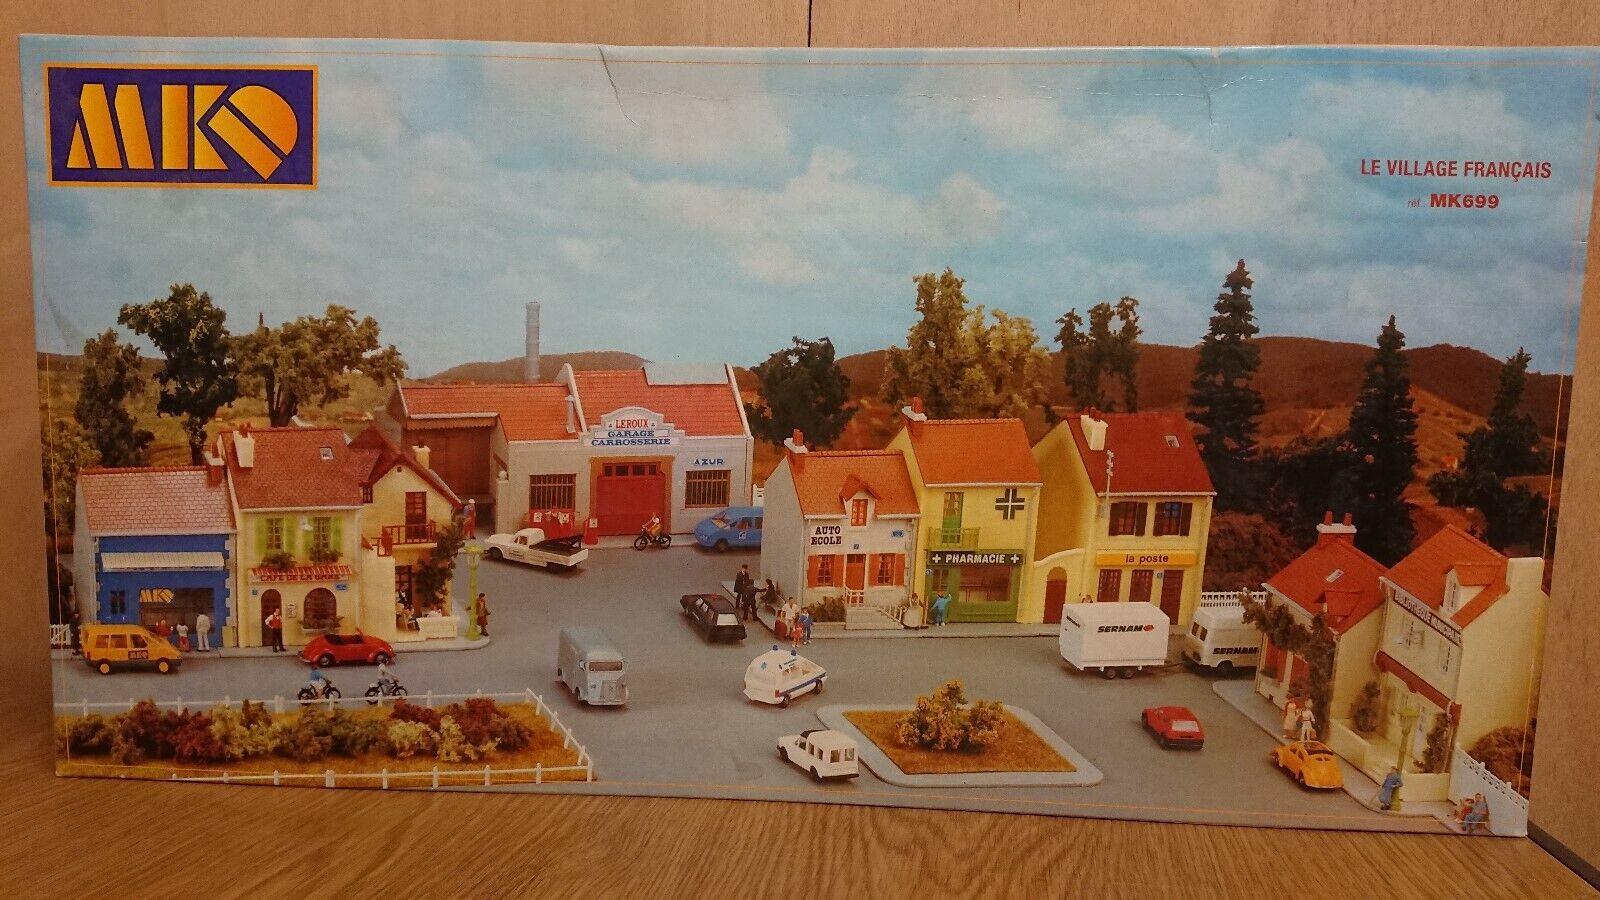 RARE MKD MK699 HO Gauge 1 87 French Village Buildings set in Kit form NEW